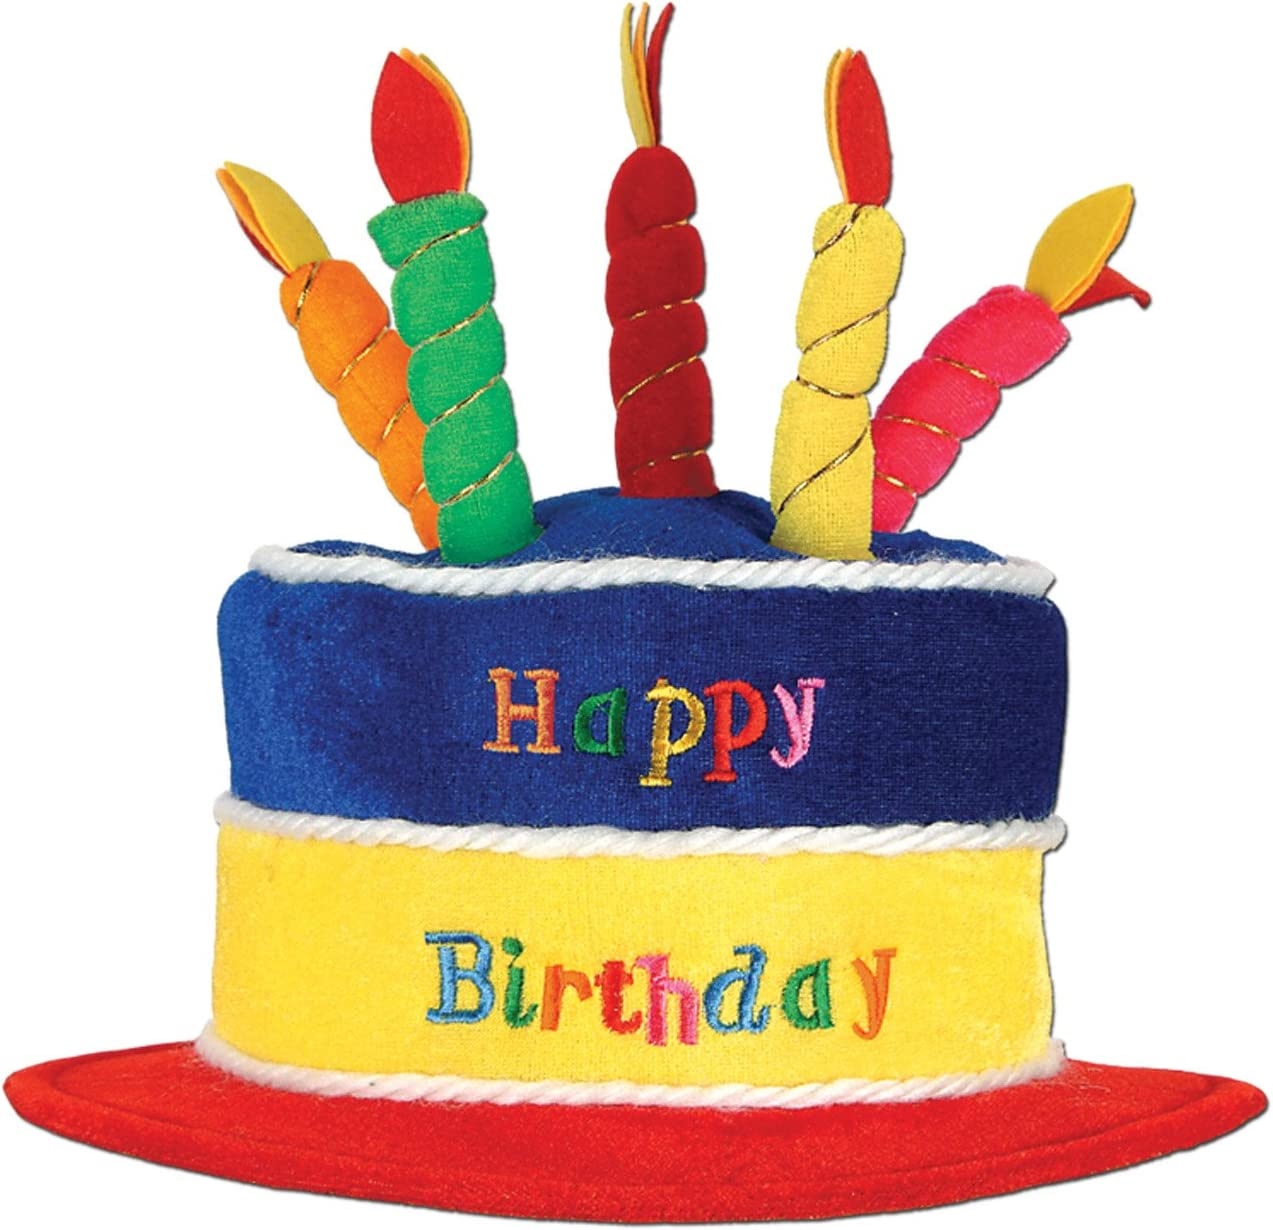 Wondrous Amazon Com Beistle 60717 Plush Birthday Cake Hat Kitchen Dining Funny Birthday Cards Online Aboleapandamsfinfo